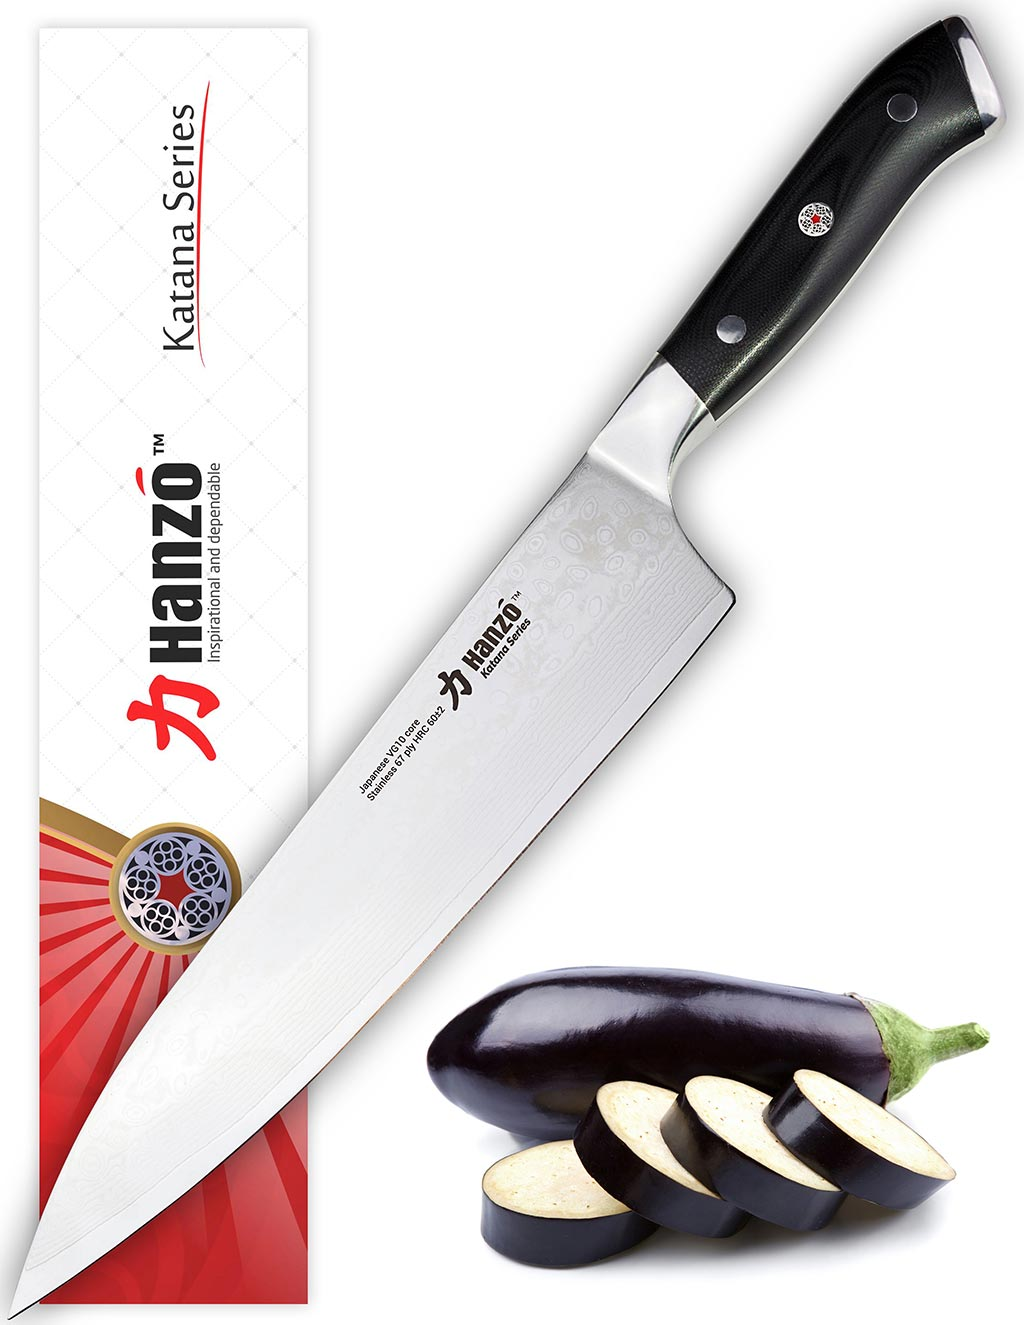 Hanzo Katana 9 5 Chef Knife Review